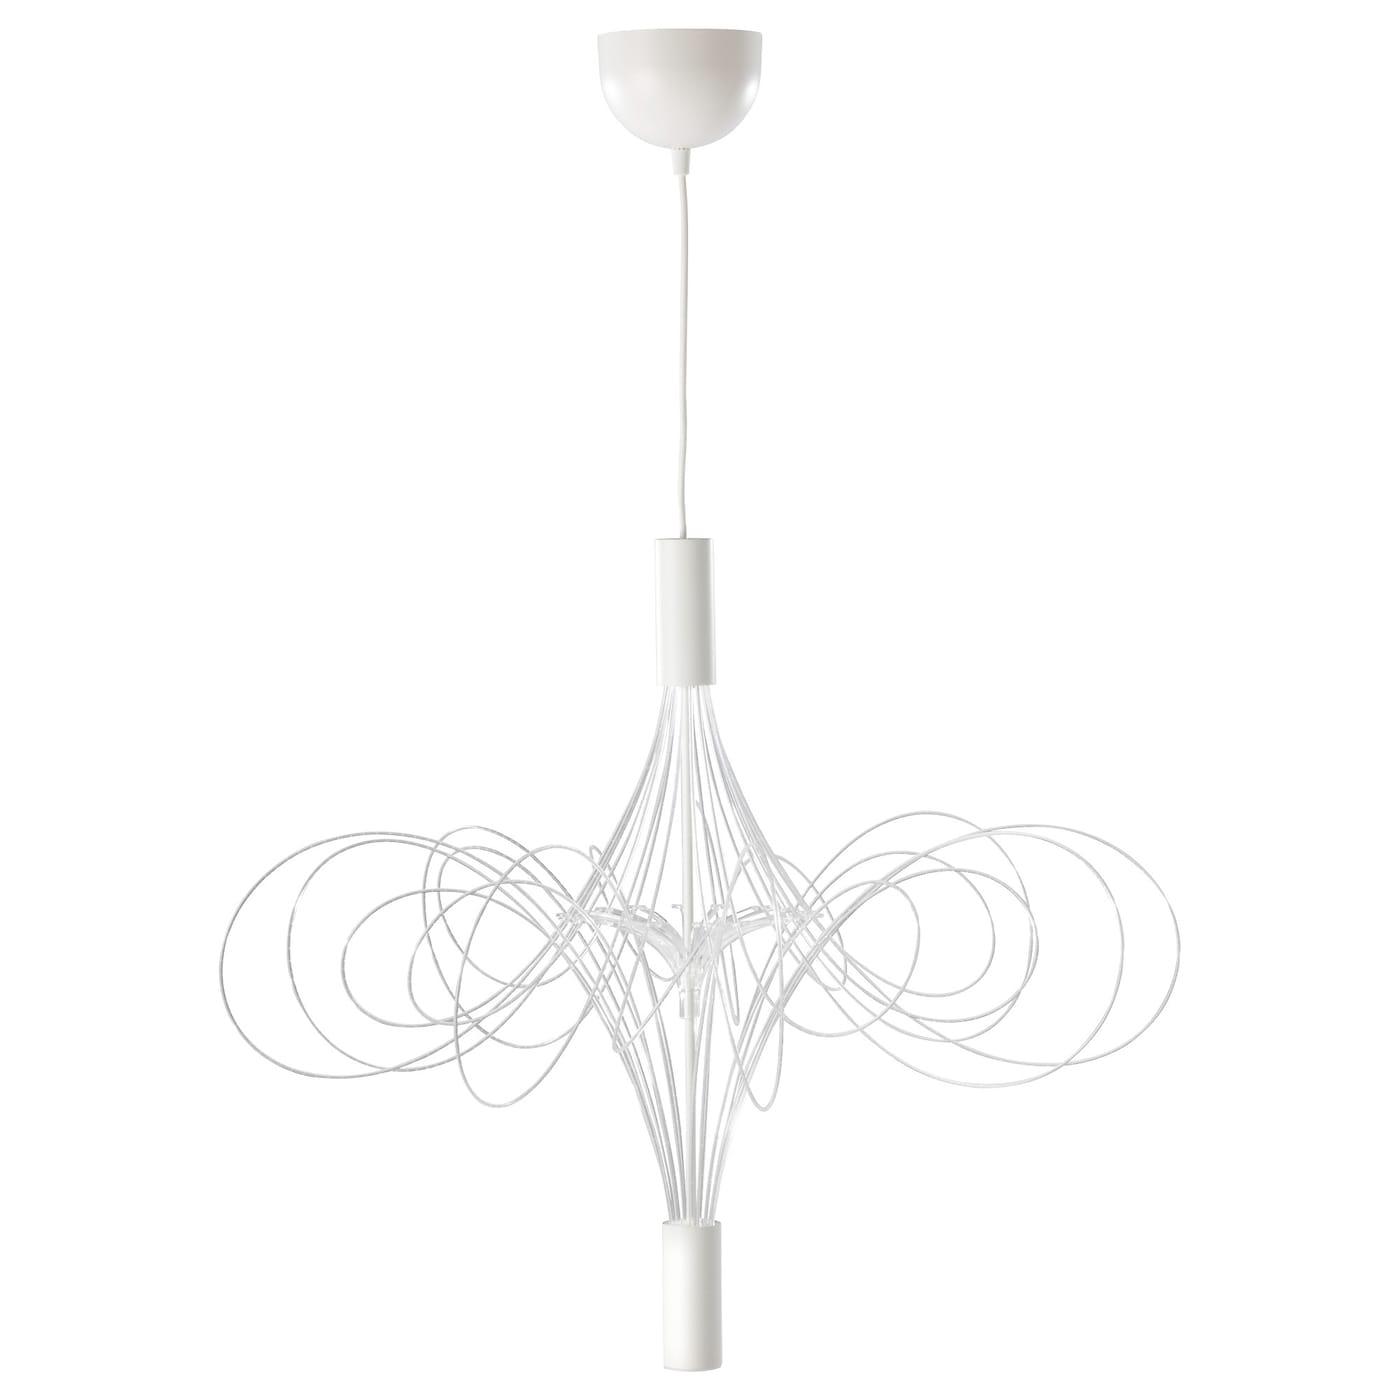 Captivating Ikea Lighting Fixtures Ceiling. Ikea Älvsbyn Led Chandelier Ikea Lighting Fixtures  Ceiling K